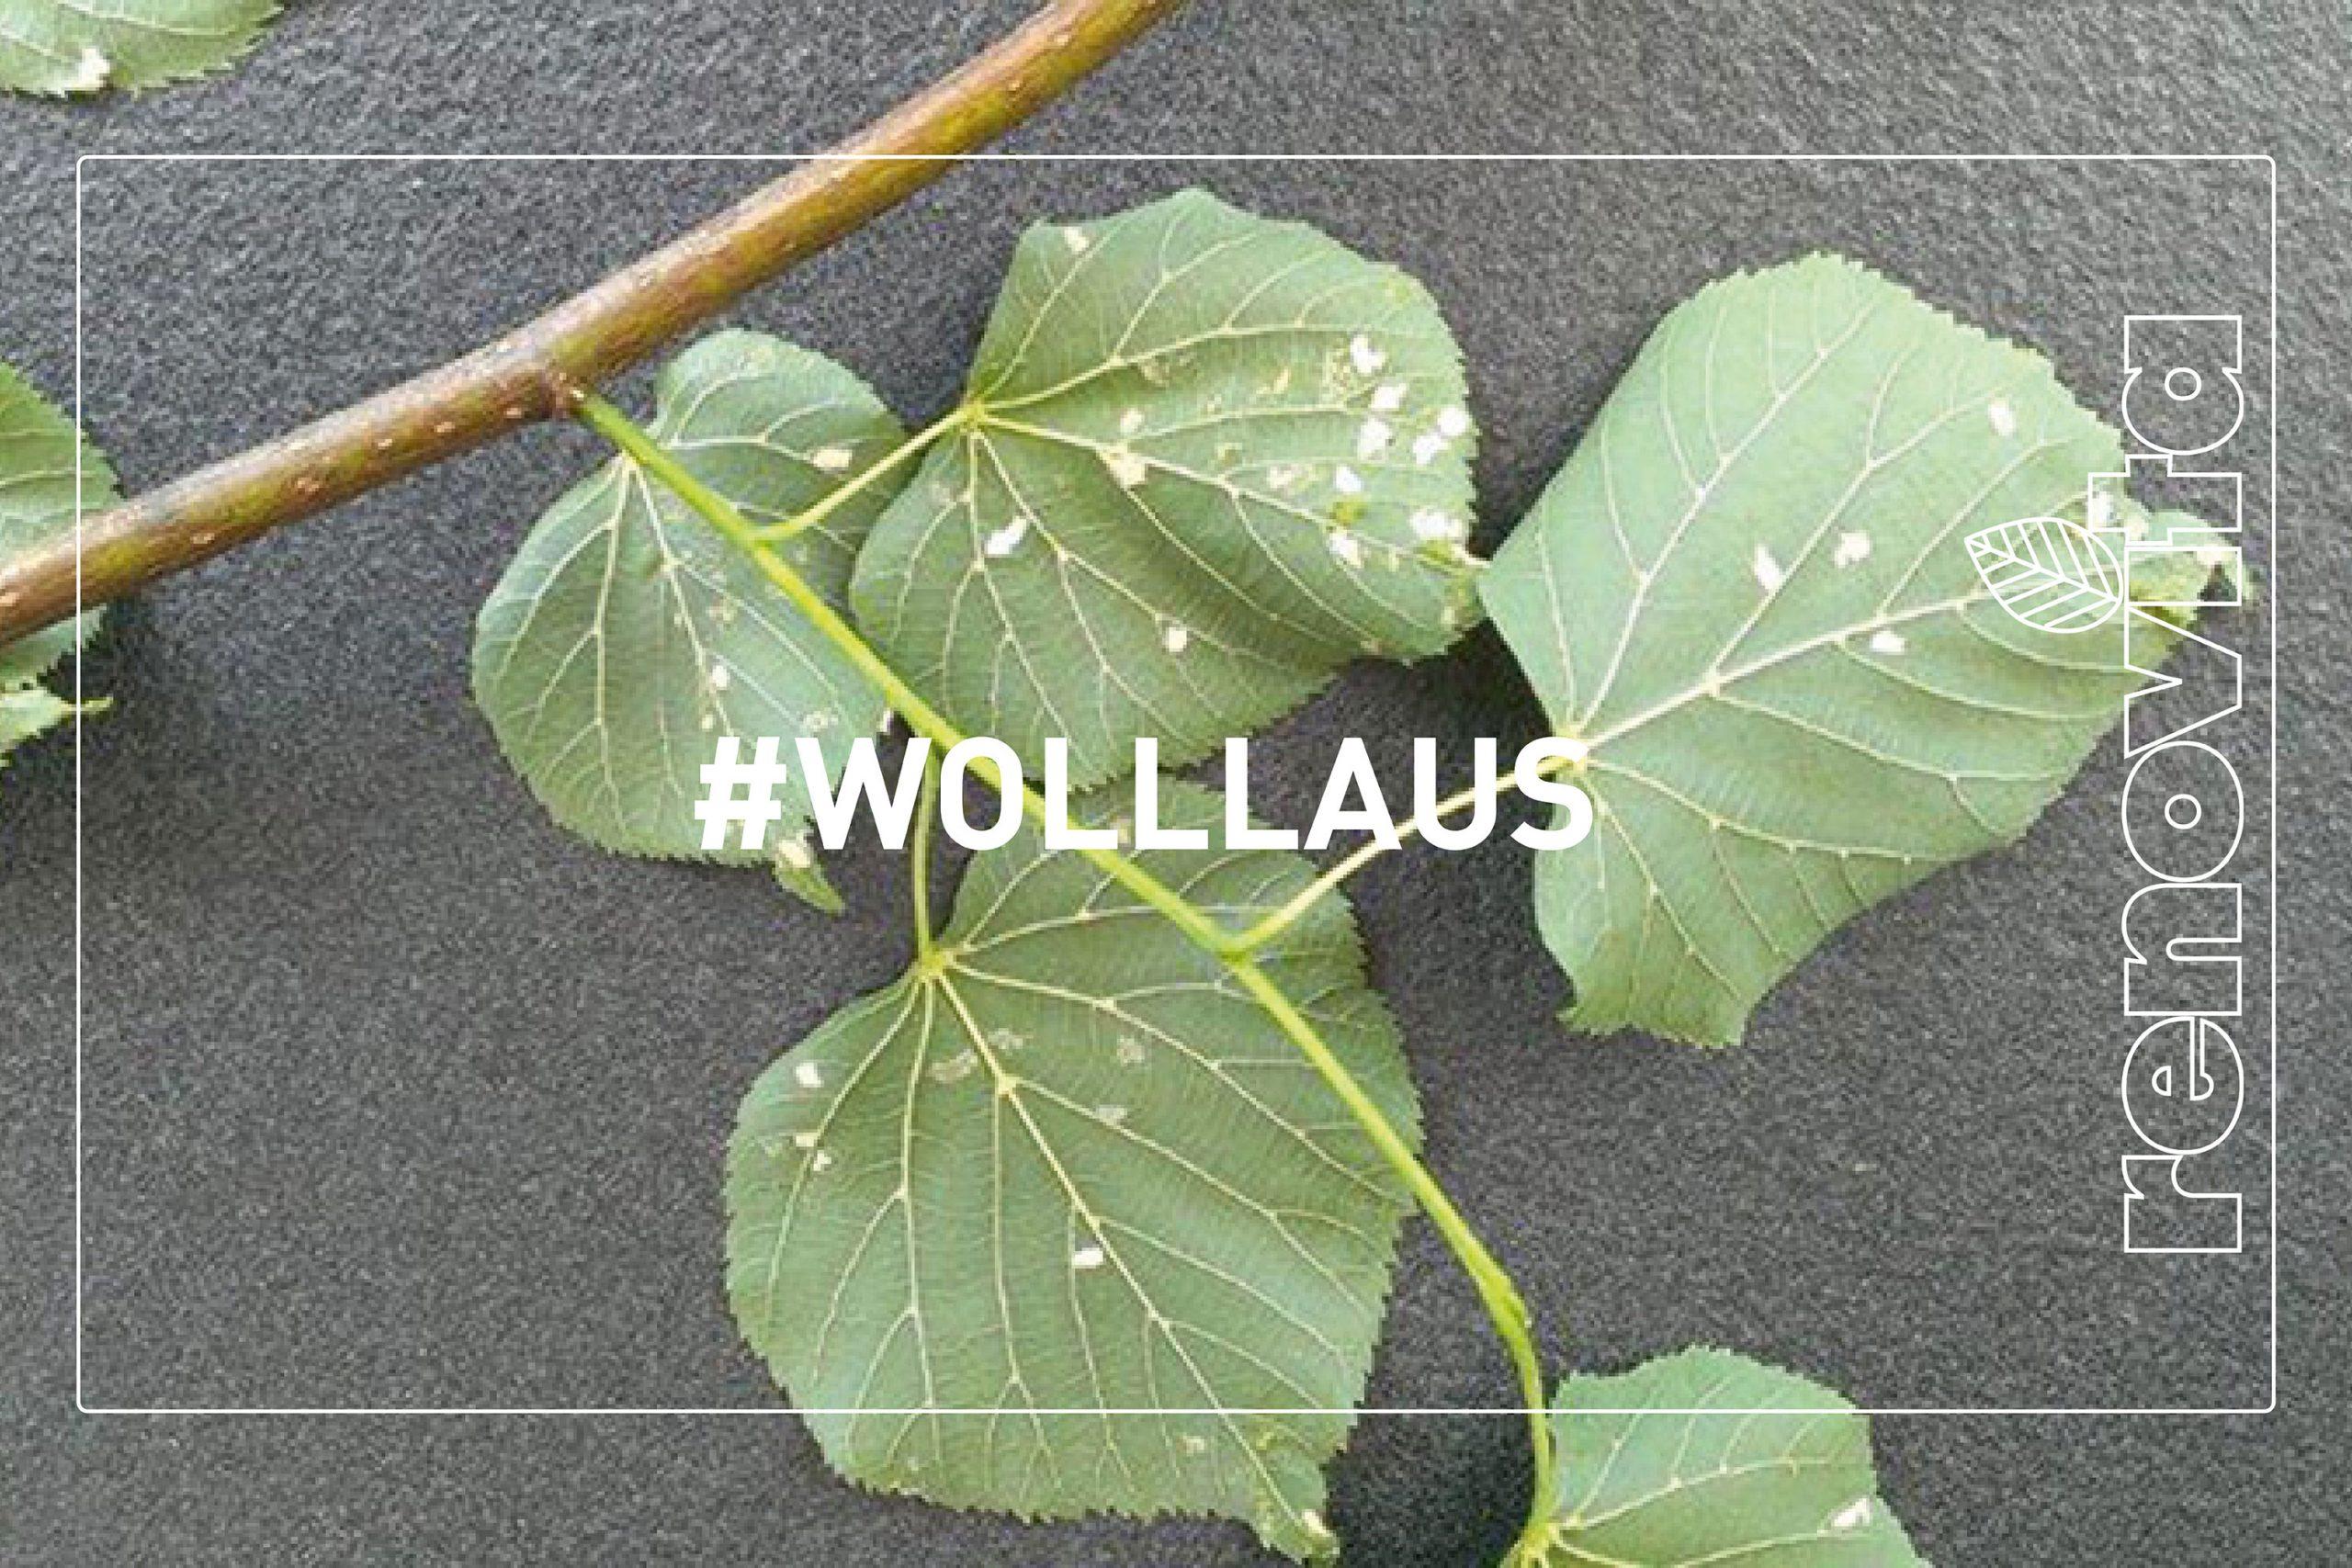 Wolllaus